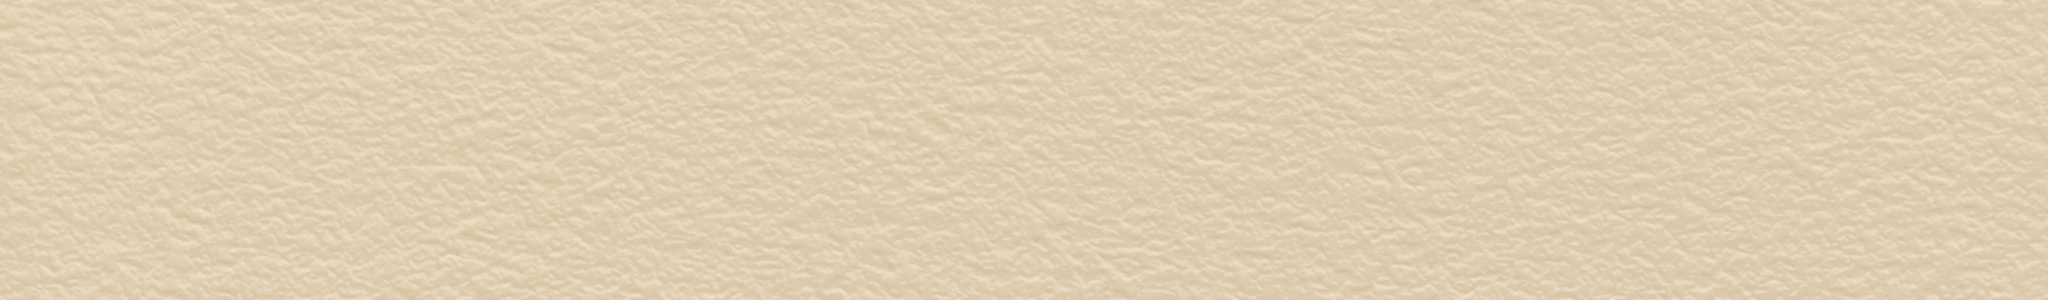 HU 18301 ABS Kante UNI Cappuccino perl DC XA